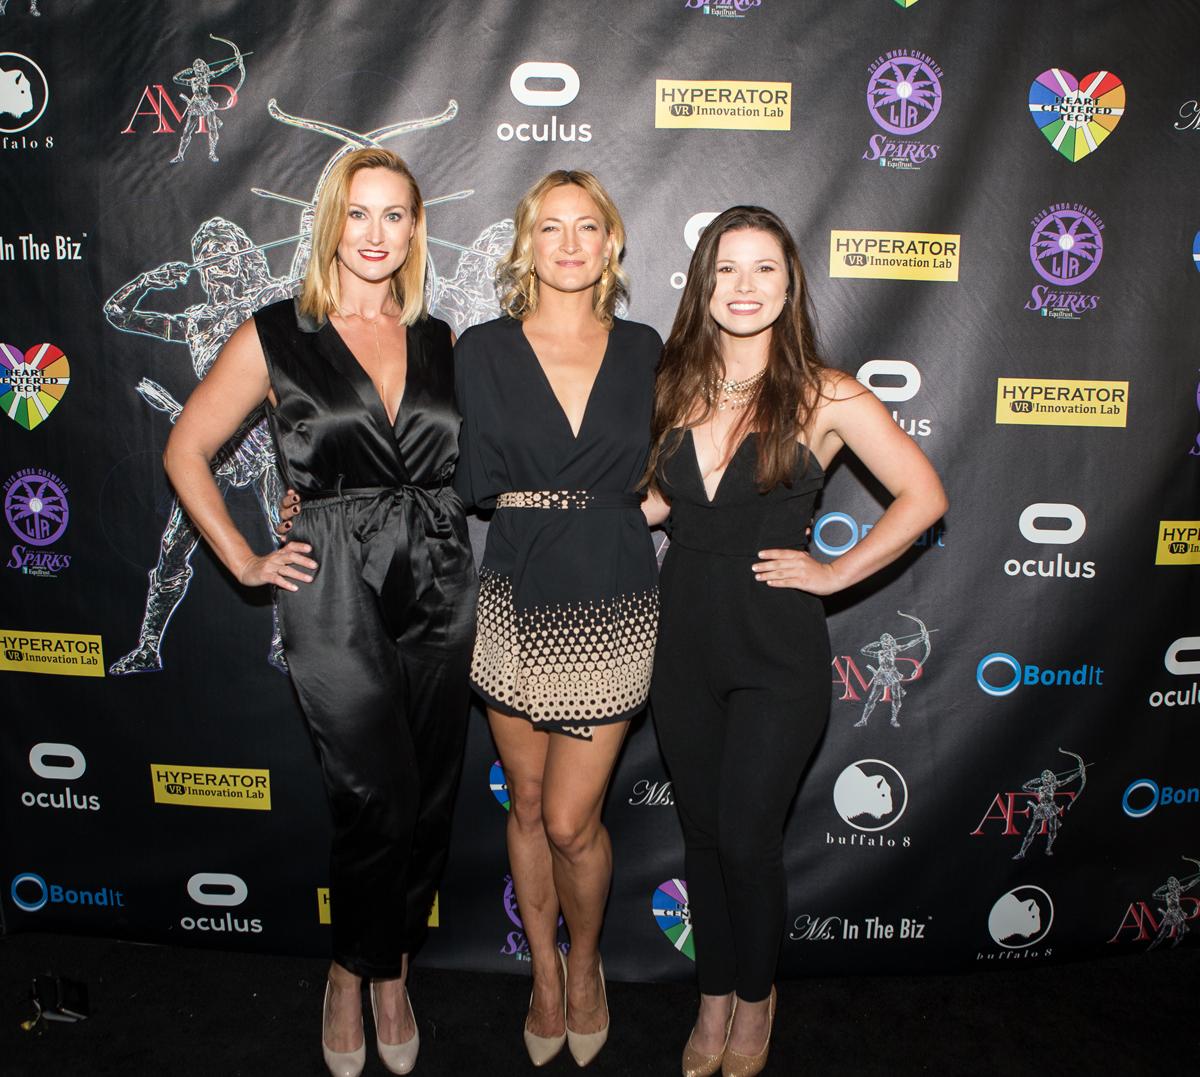 Vanessa Cater, Zoe Bell, Sarah Mun